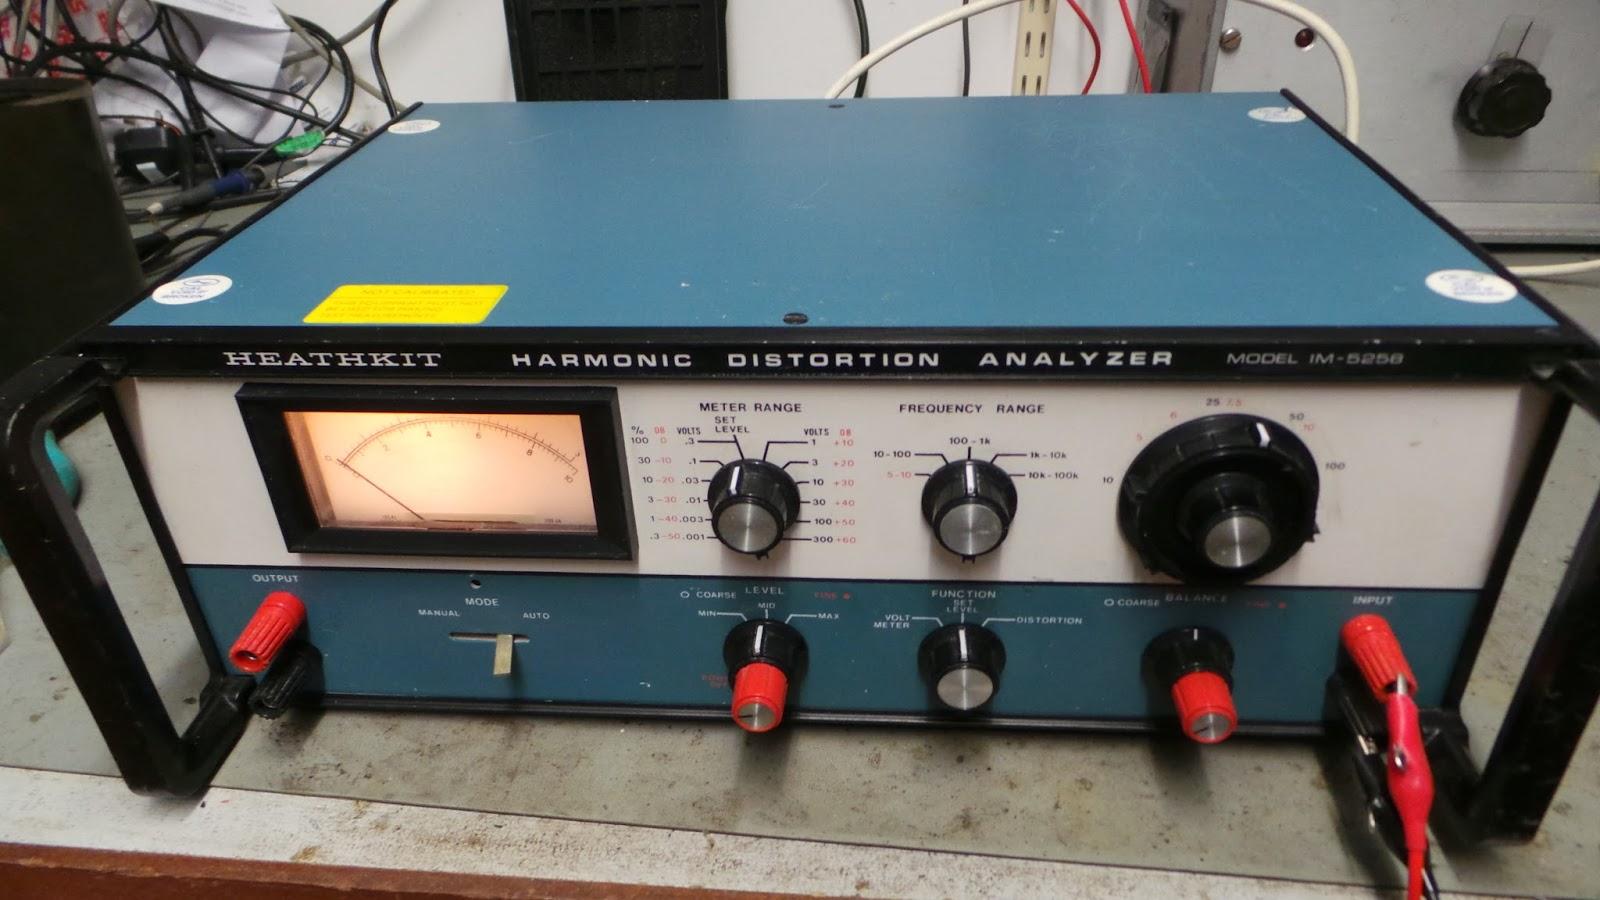 Doz' Blog: Vintage test gear - Heathkit Harmonic Distortion Analyzer